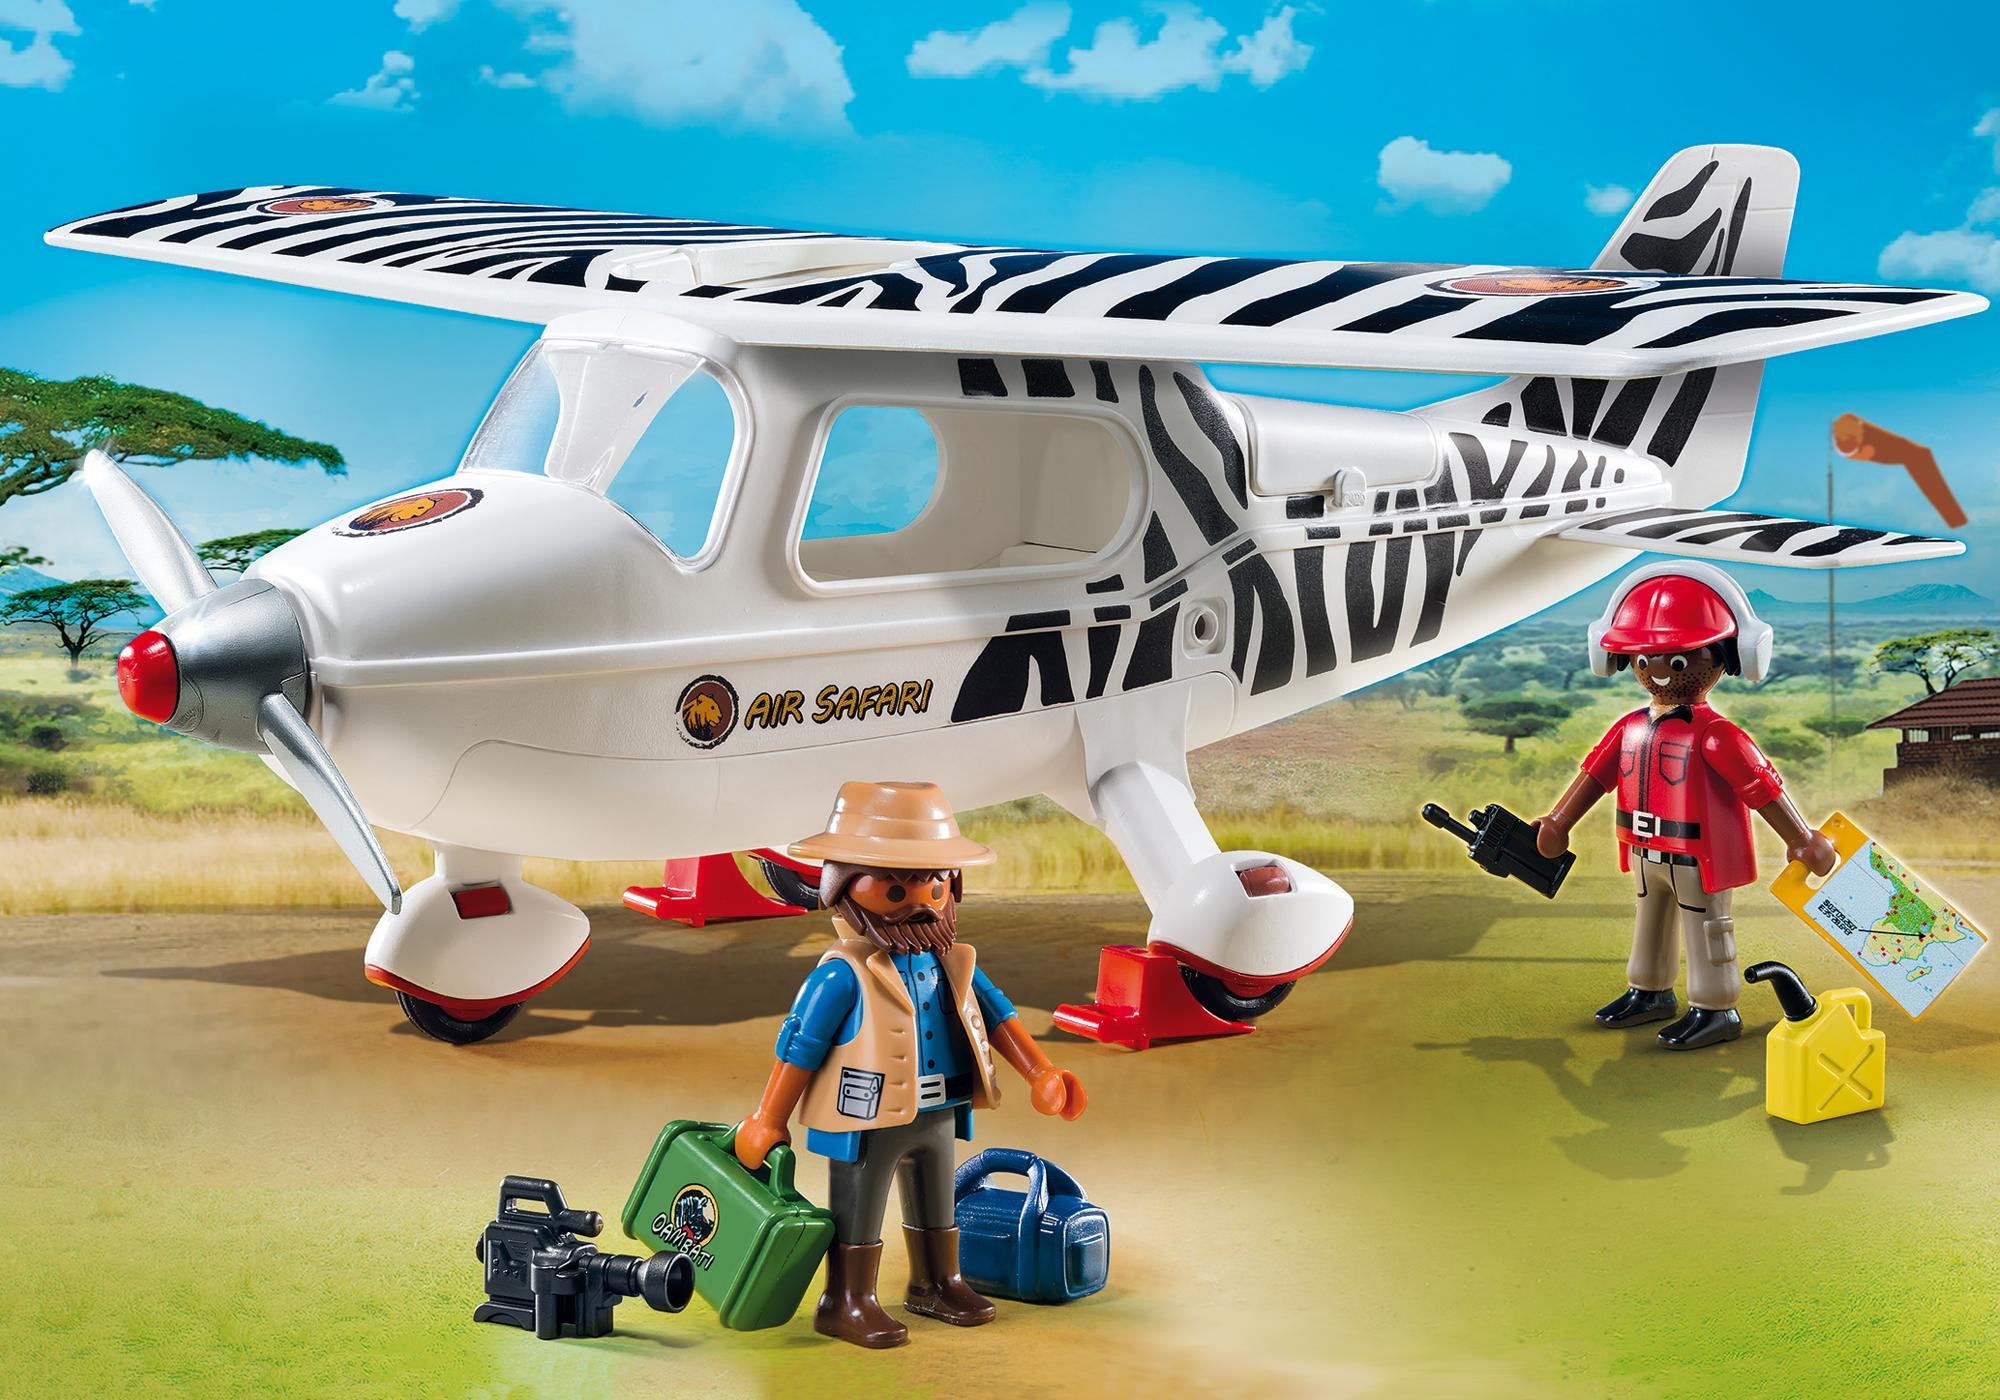 http://media.playmobil.com/i/playmobil/6938_product_detail/Safari vliegtuig